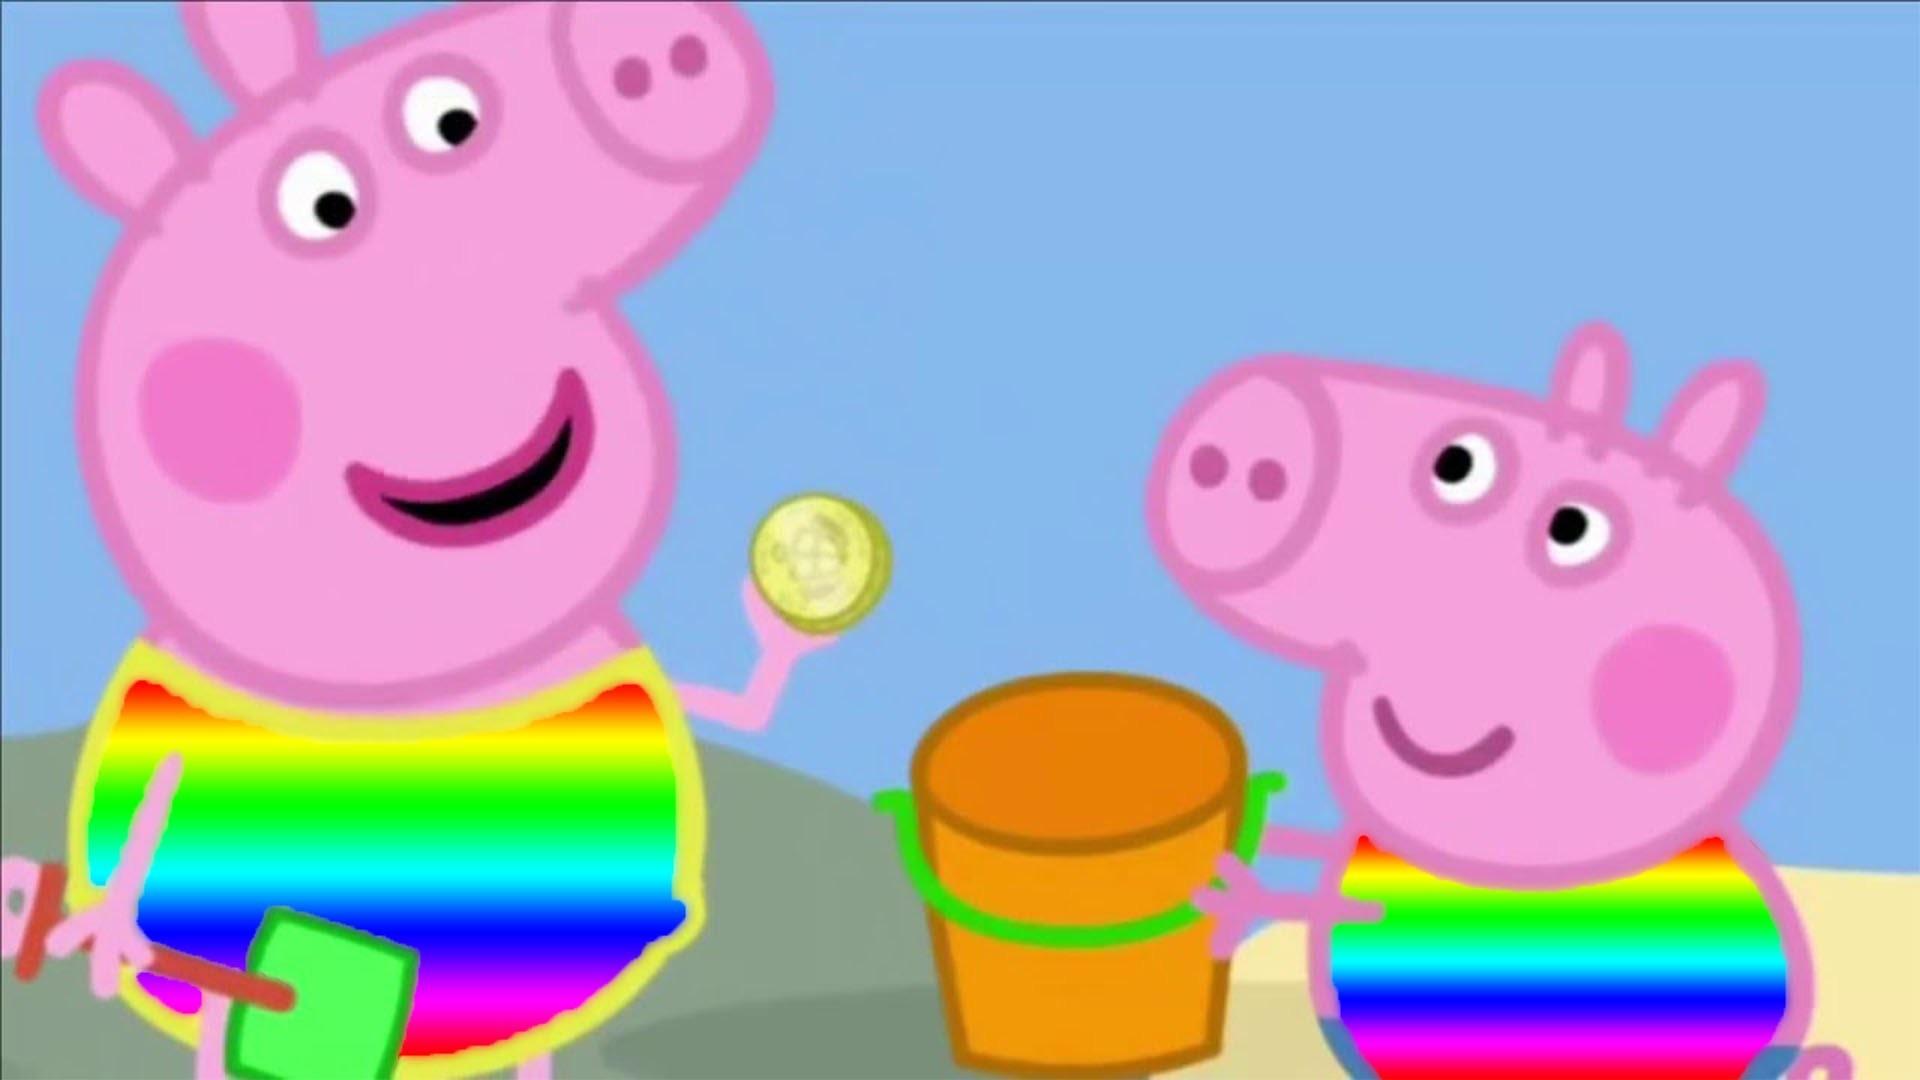 Peppa Pig English Episodes New Episodes 2016 Full Movie Non Stop – YouTube